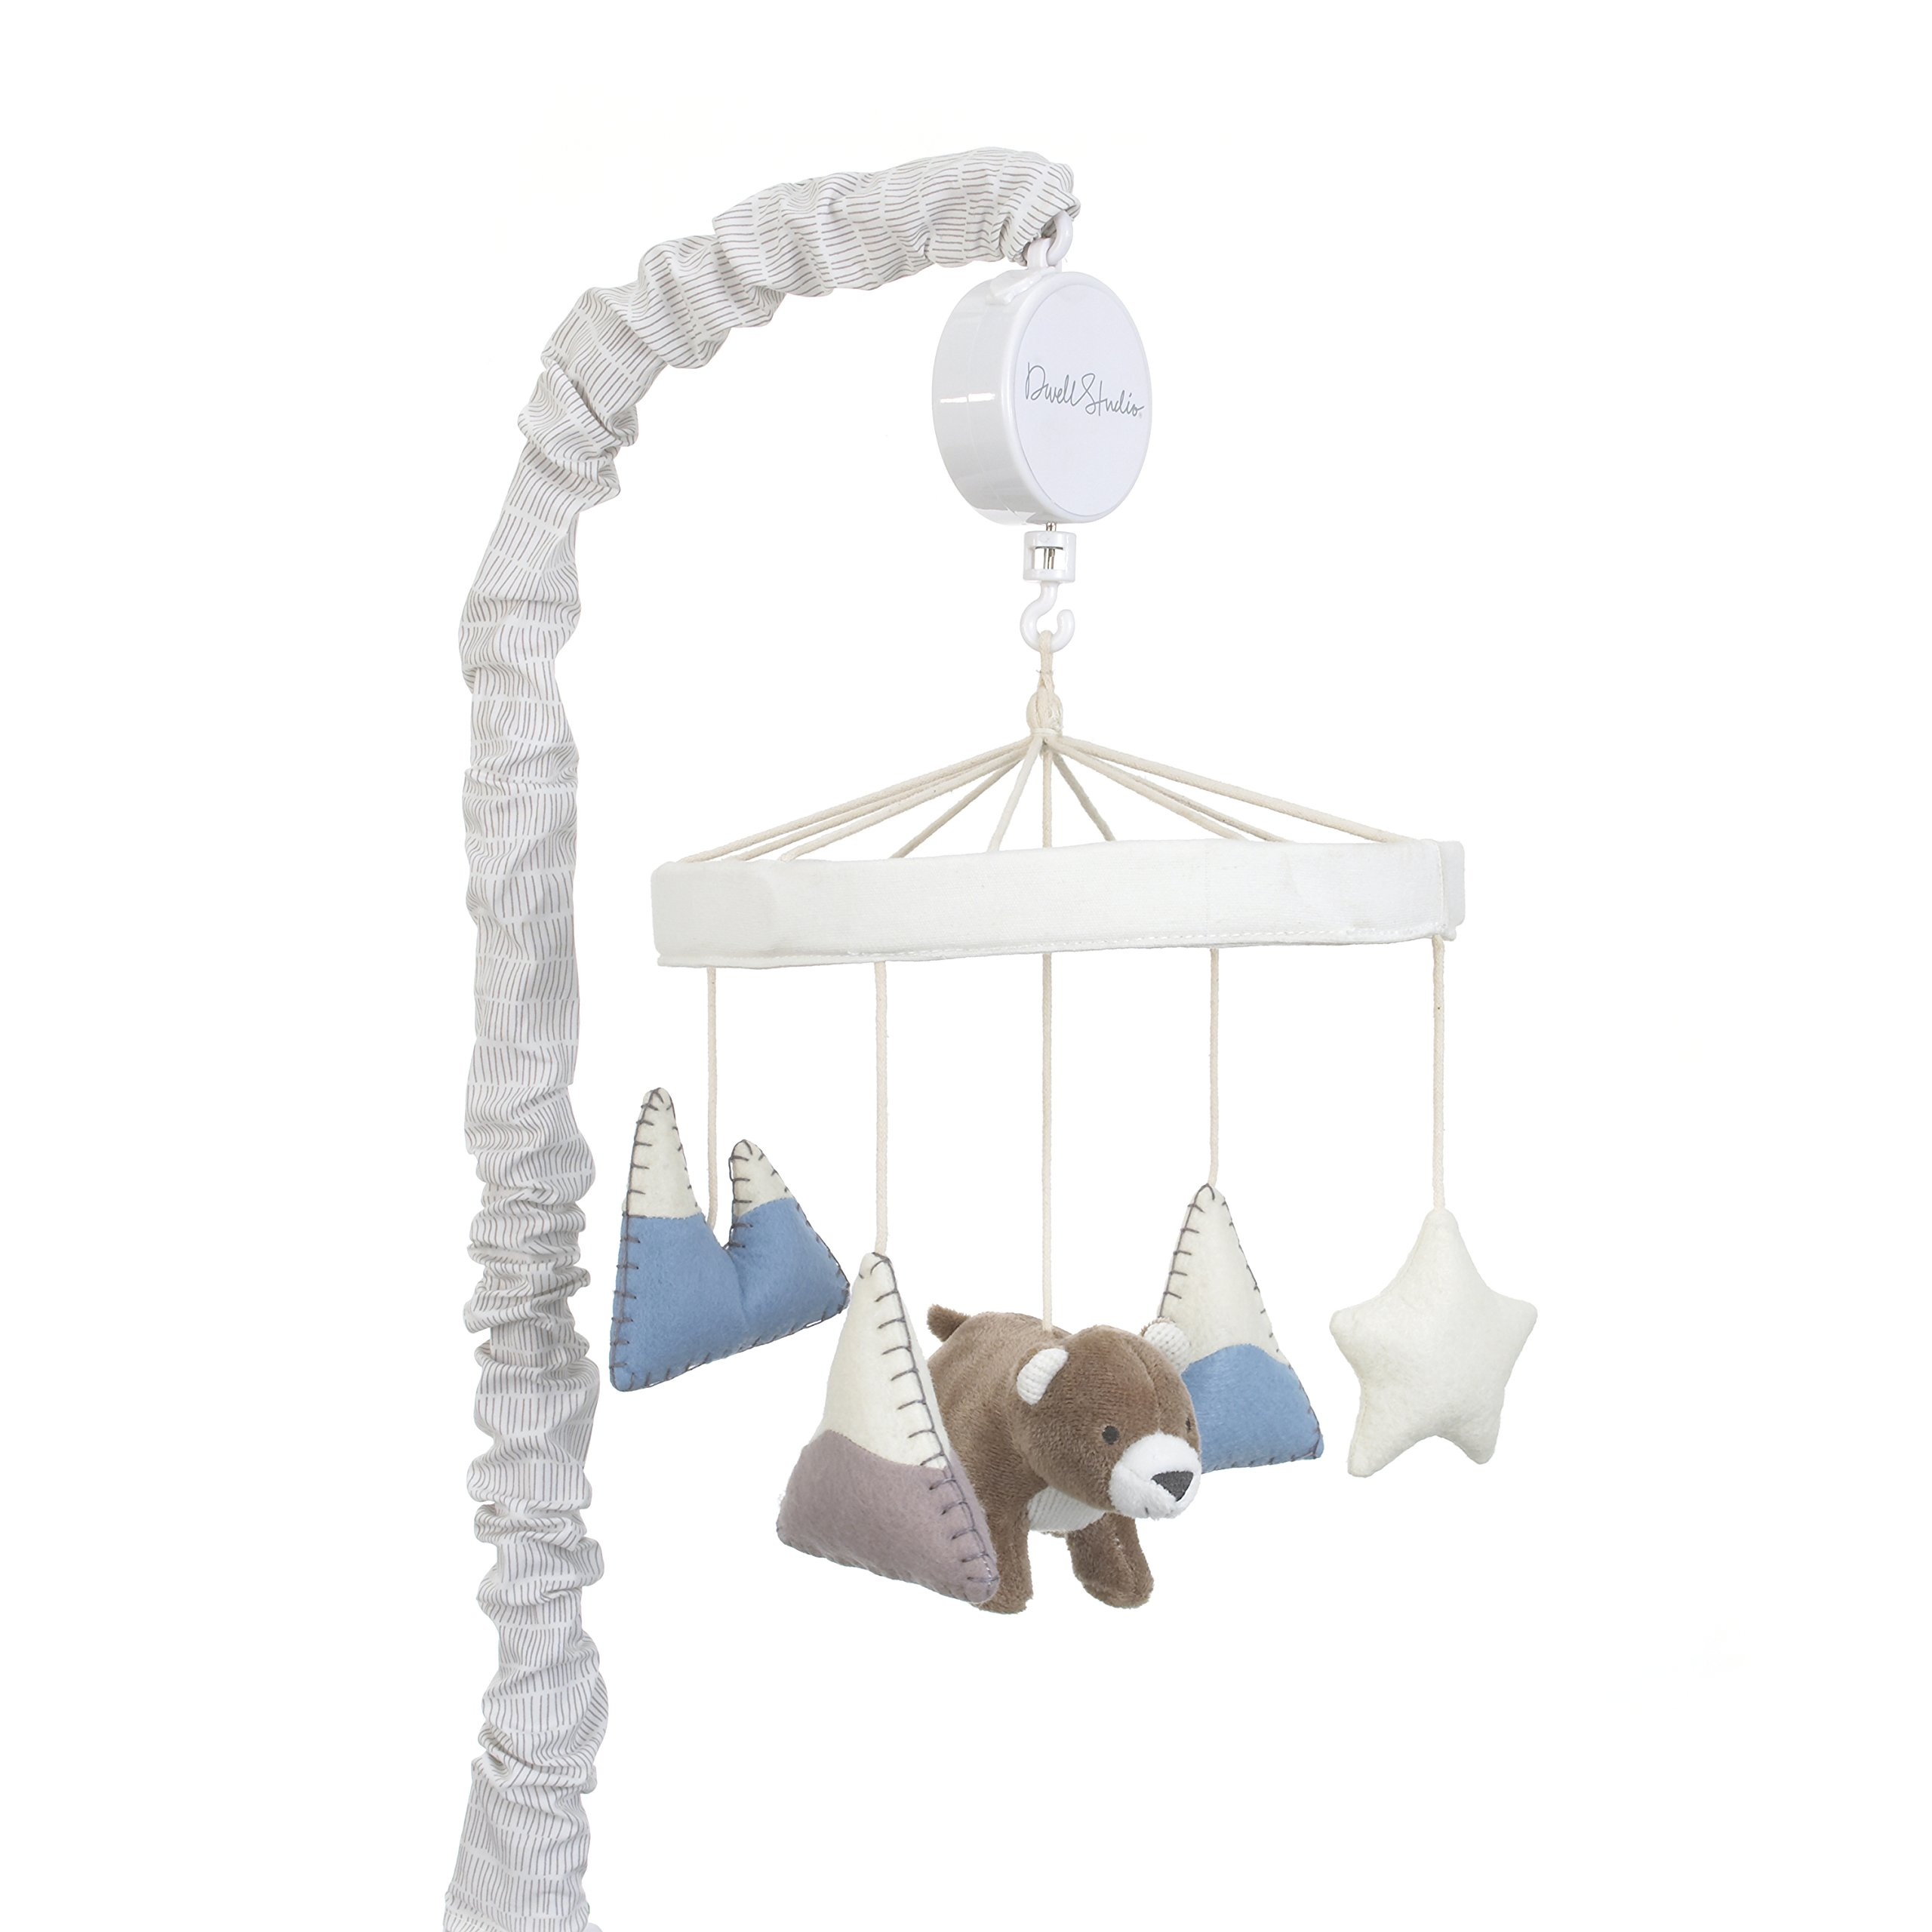 Dwell Studio Bear Hugs Nursery Crib Musical Mobile, Blue/Gray/White Bear/Mountains